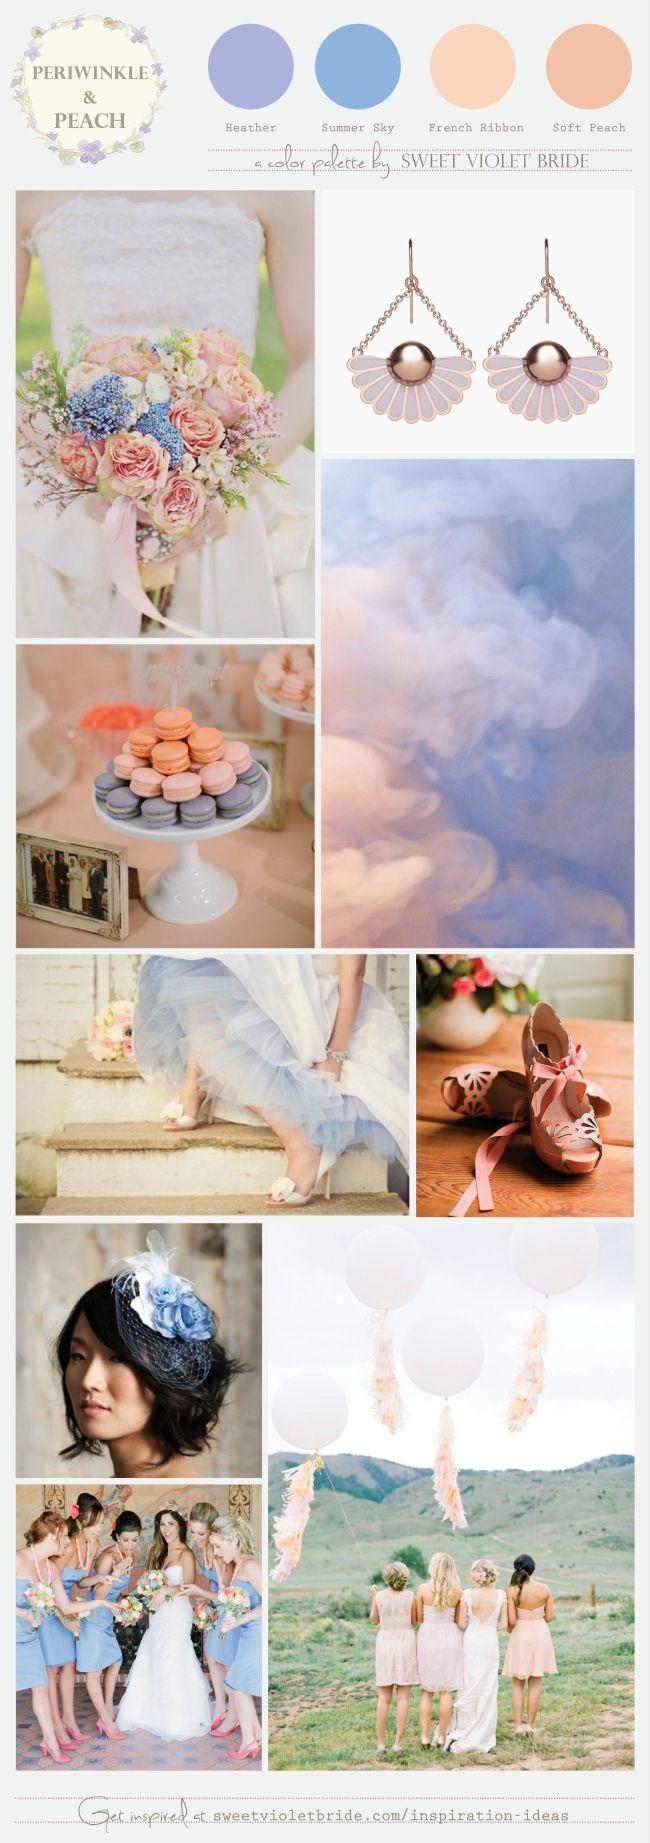 Periwinkle Wedding Colors   Wedding Color Palette: Peach & Periwinkle